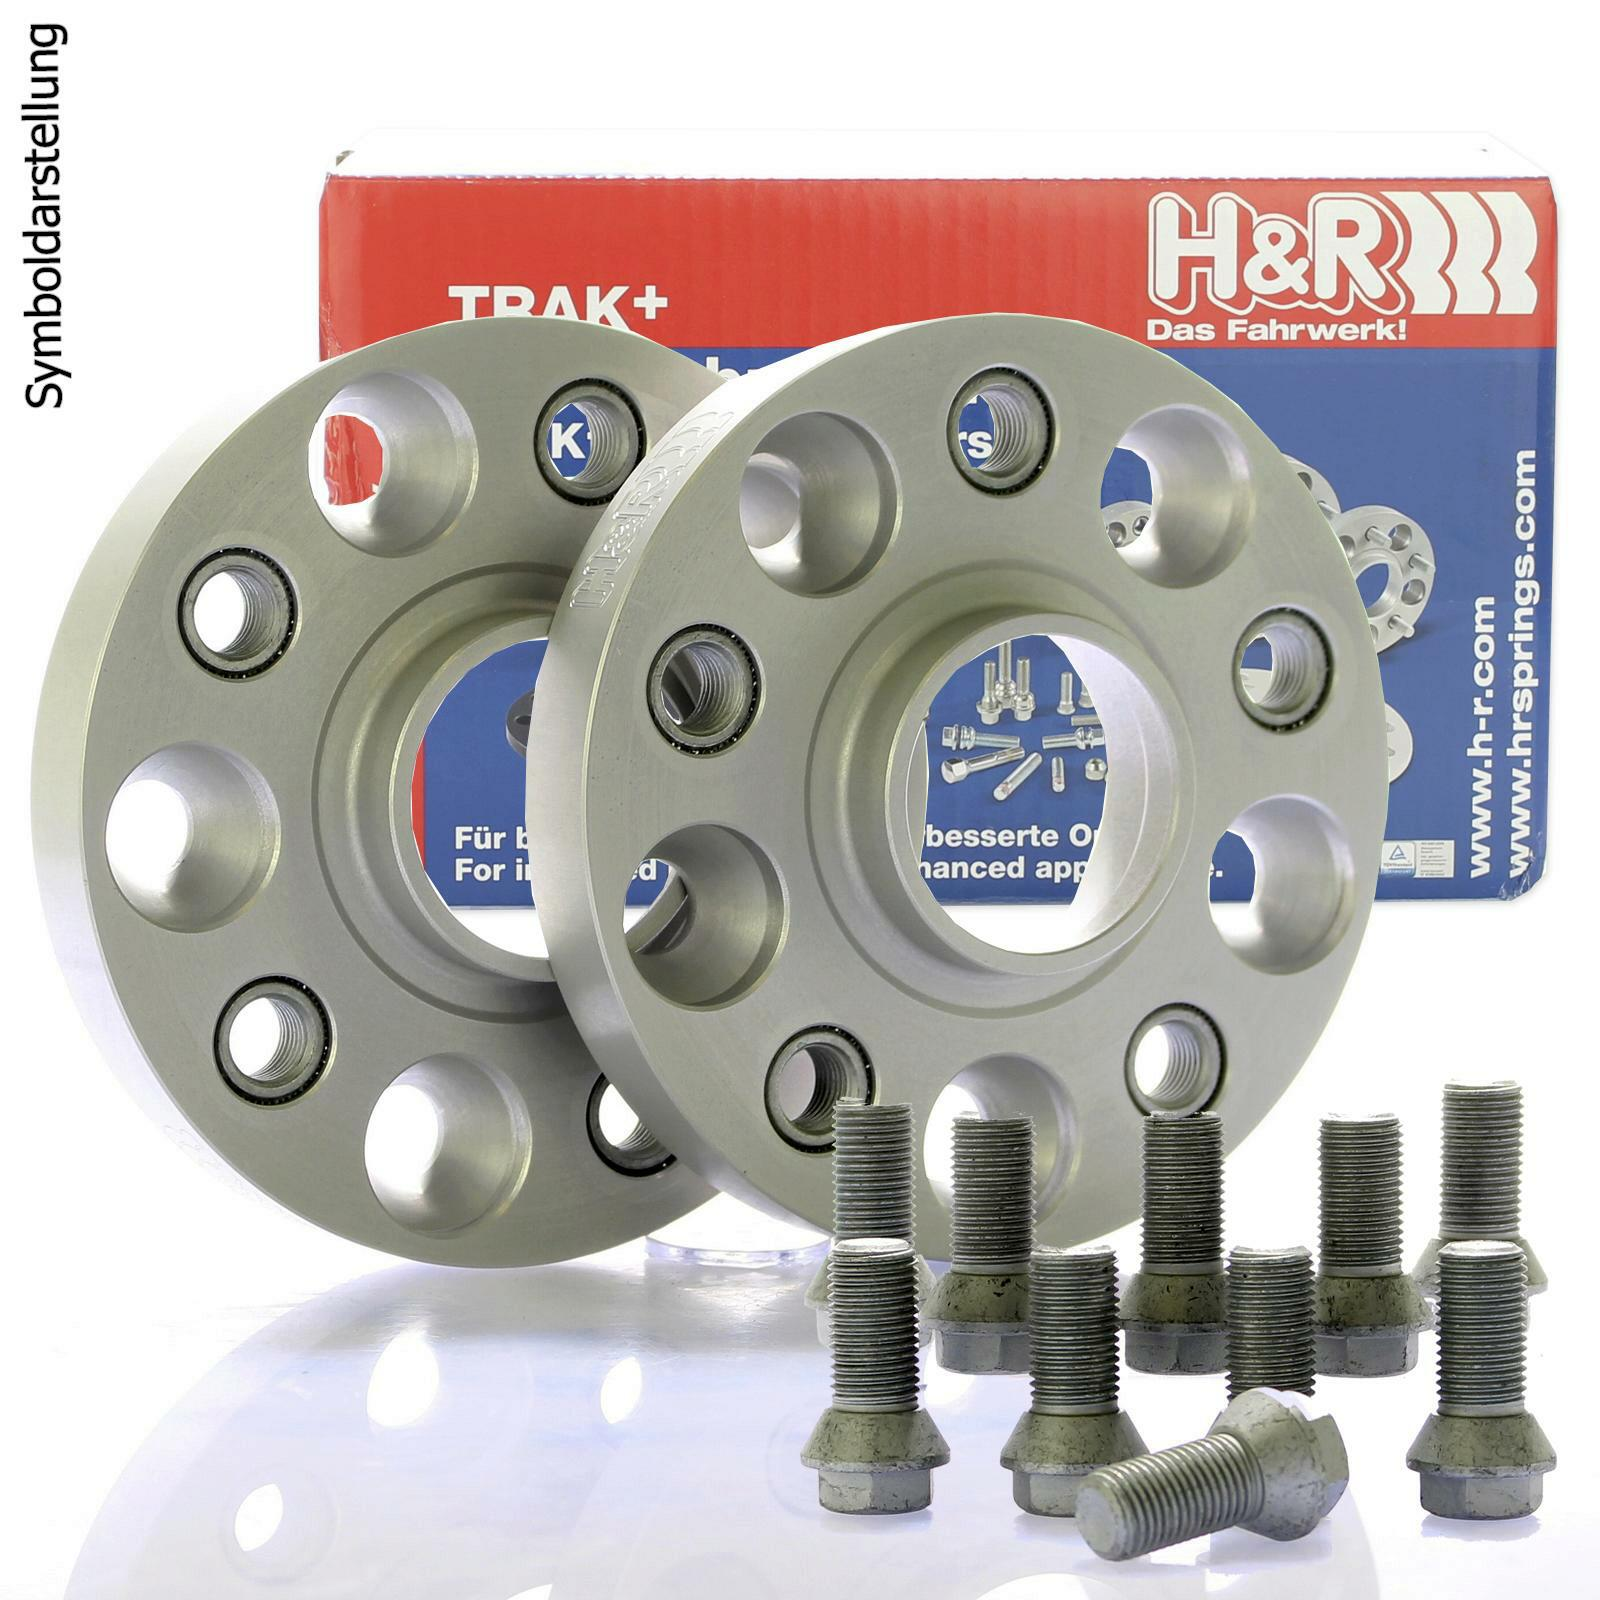 H&R DRA Spurplatten Spurverbreiterung Distanzscheibe 5x112 50mm // 2x25mm